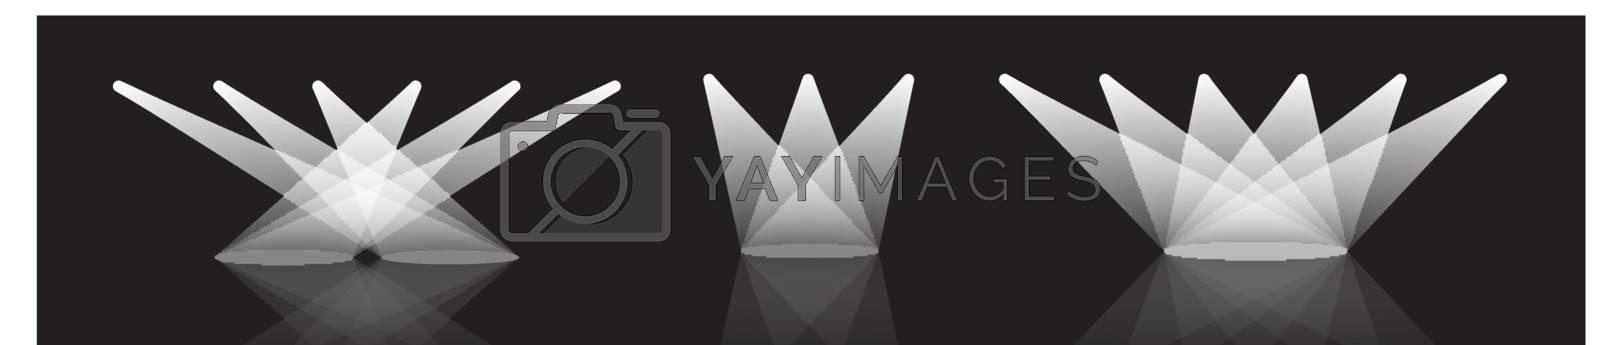 Spotlight vector set illustration with reflection on black background